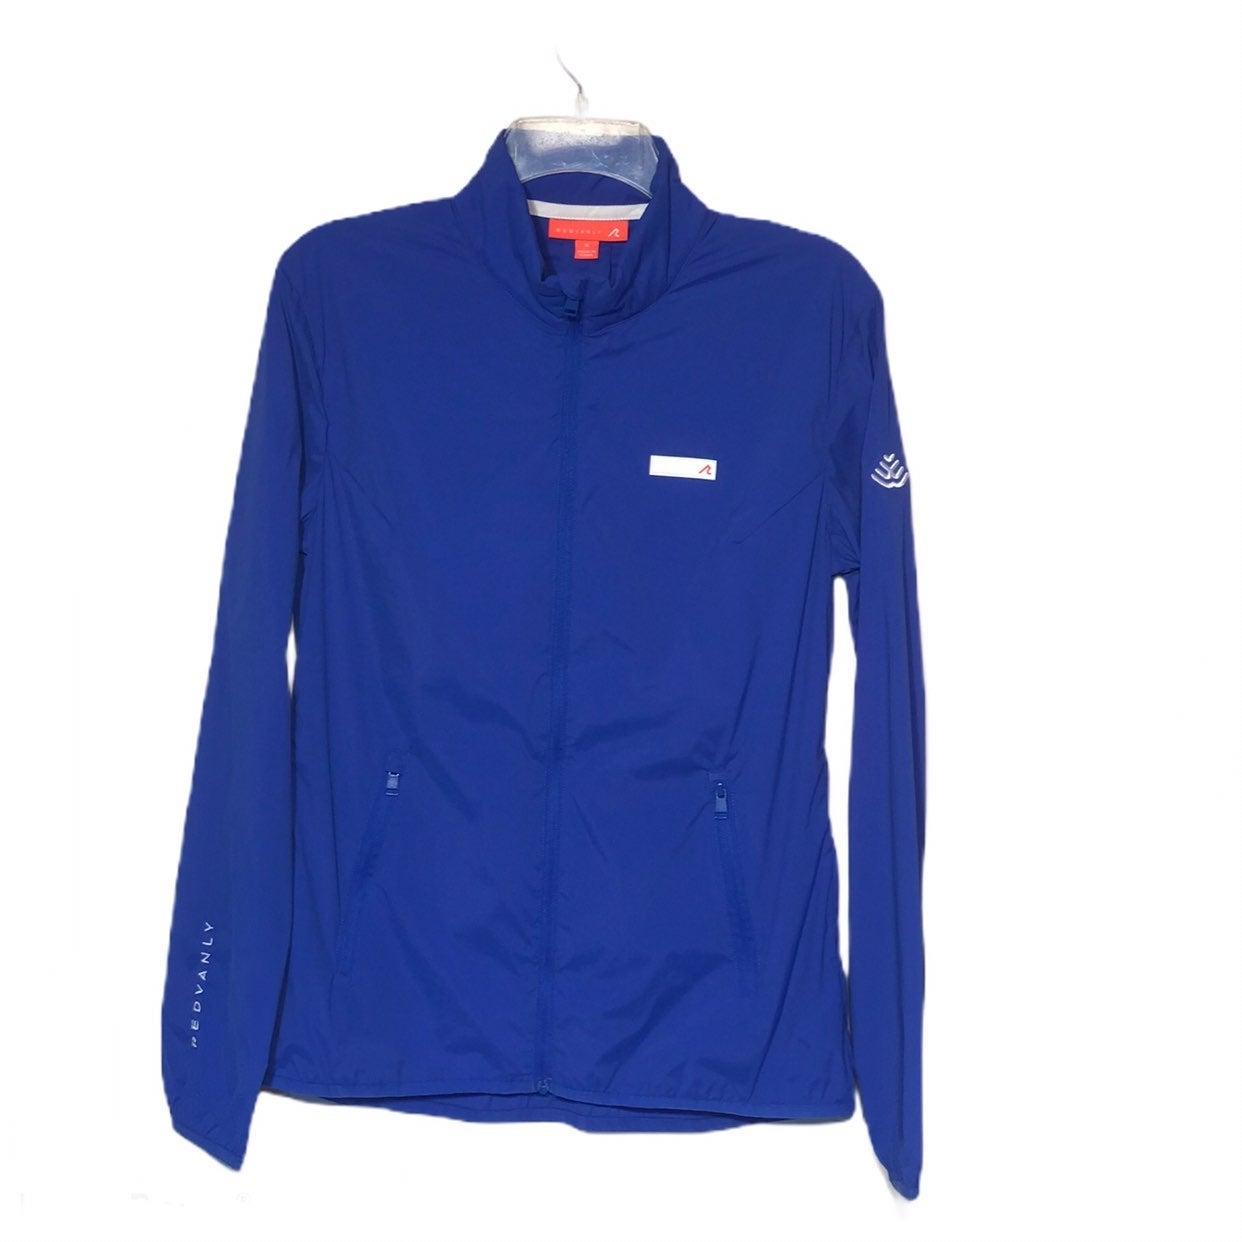 Redvanly Blue Windbreaker Golf Jacket